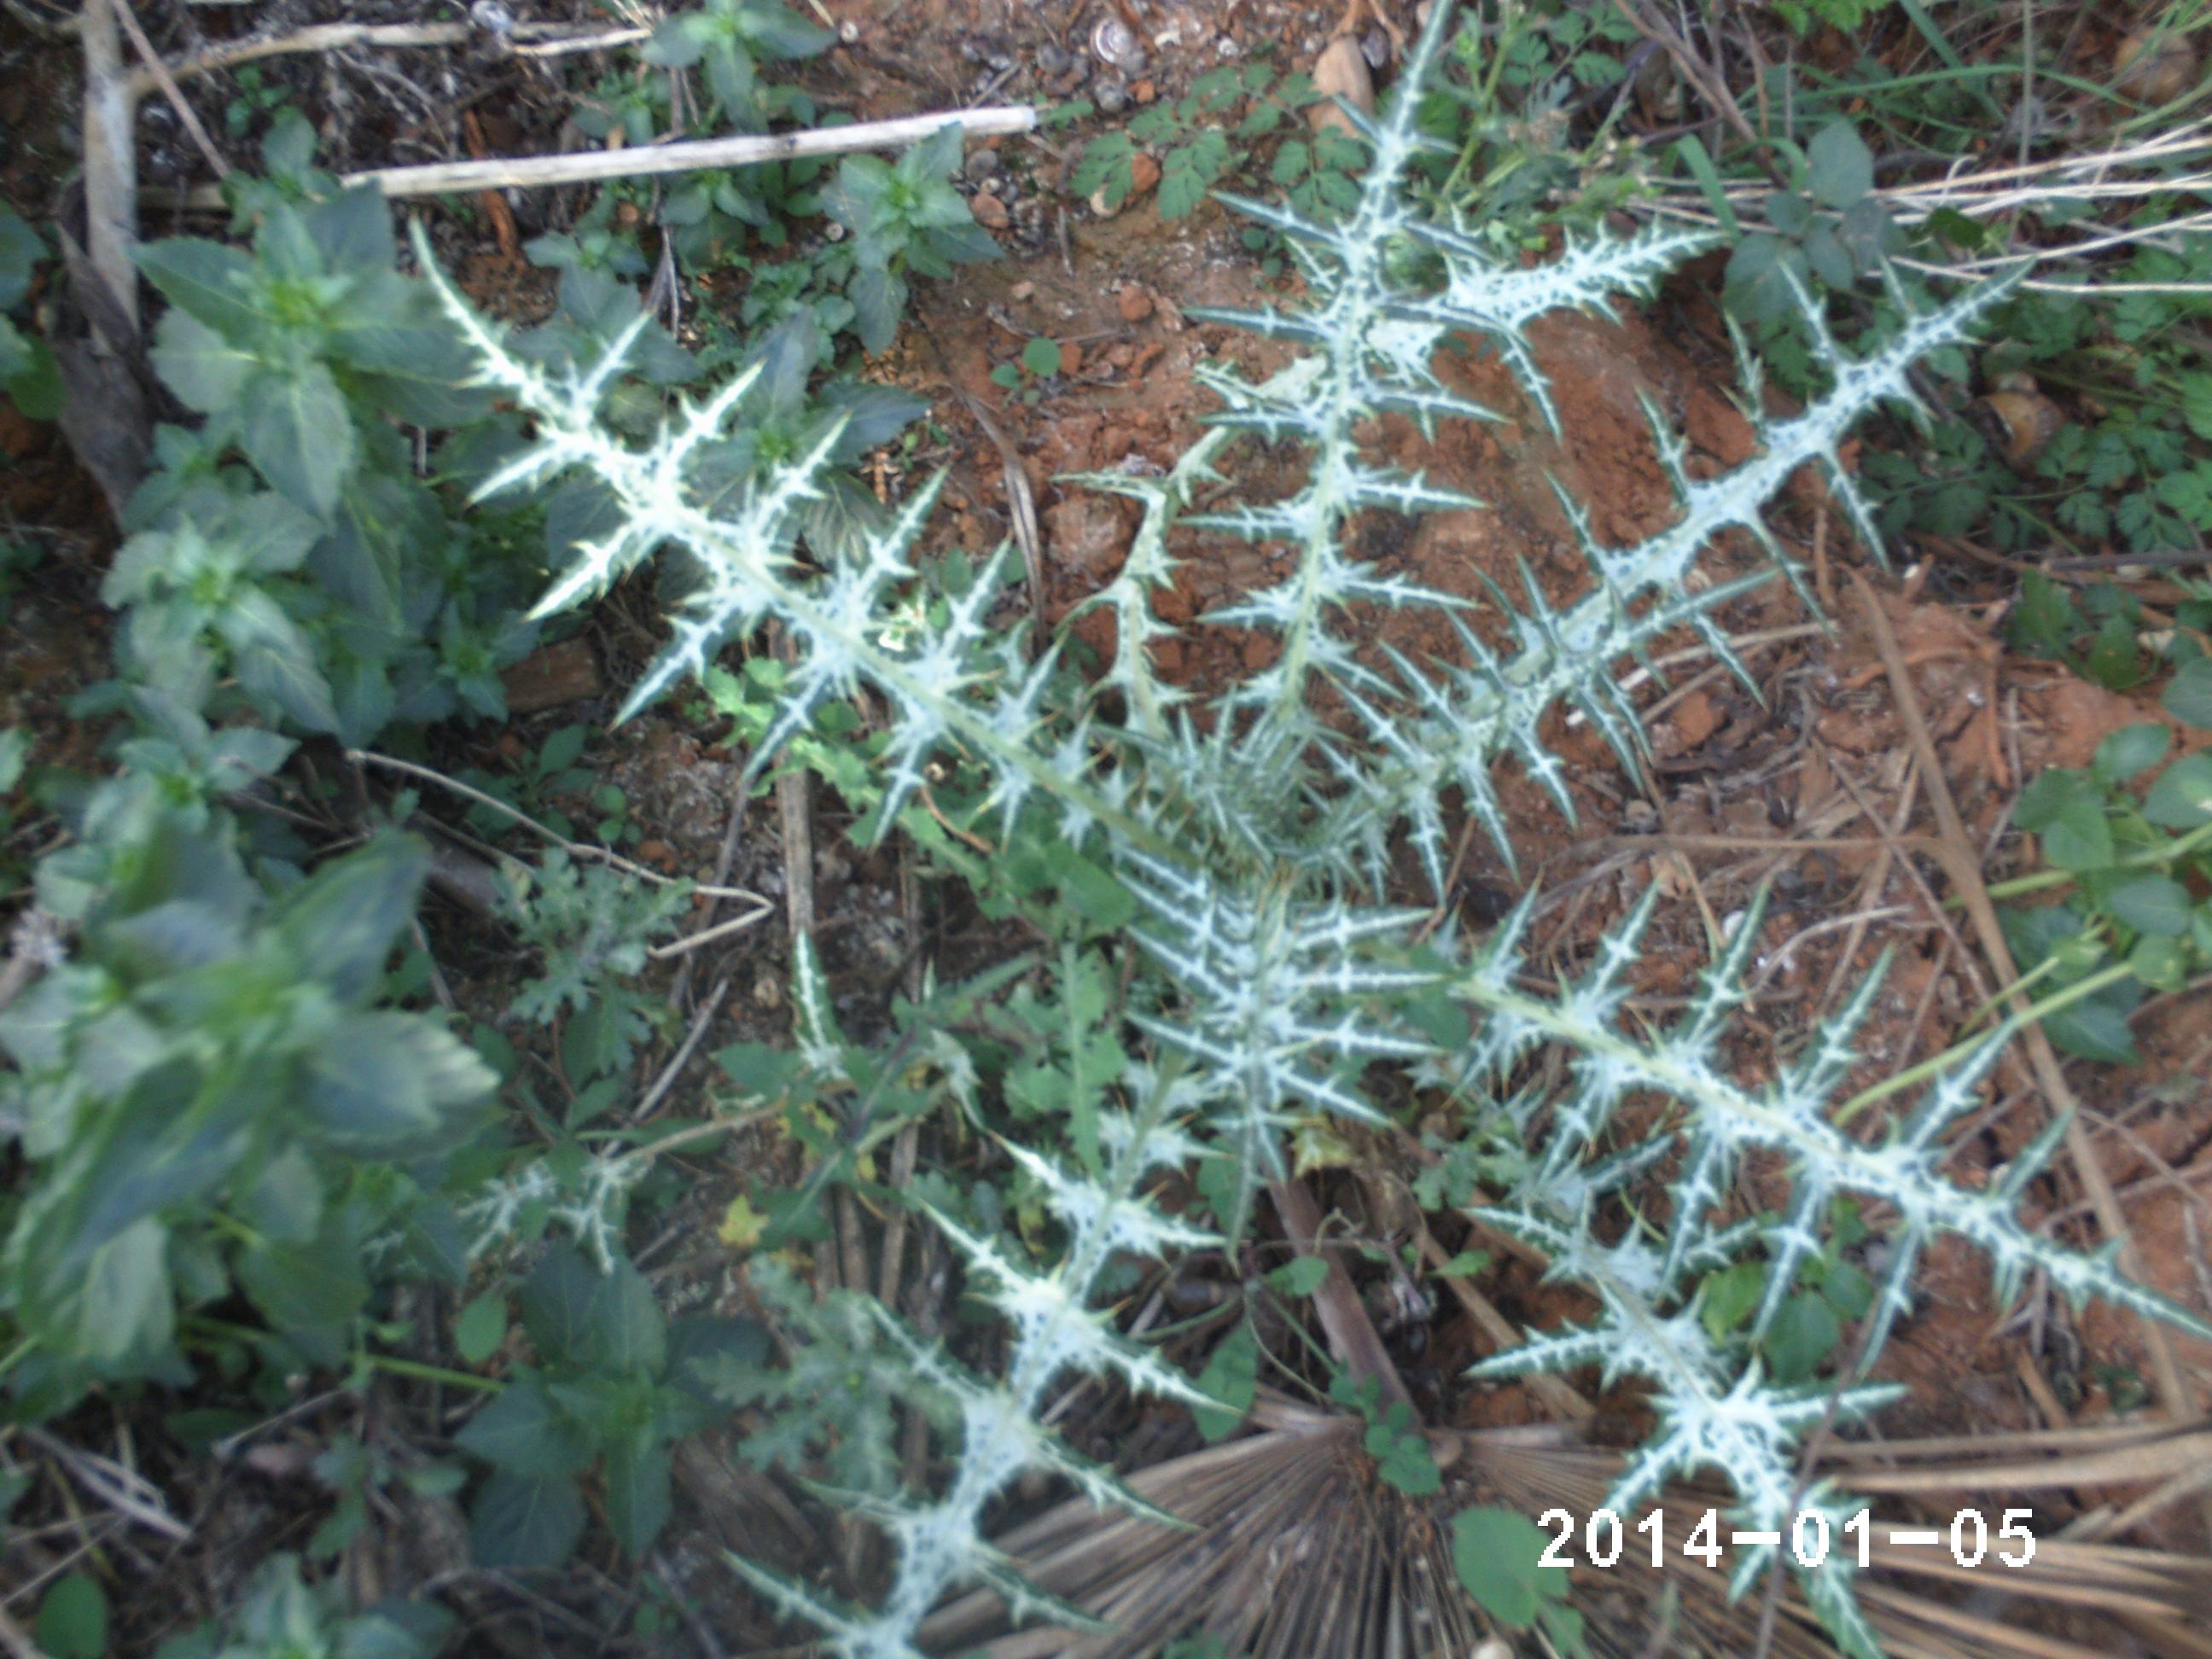 Plantas silvestres  aviario elreydelmixto